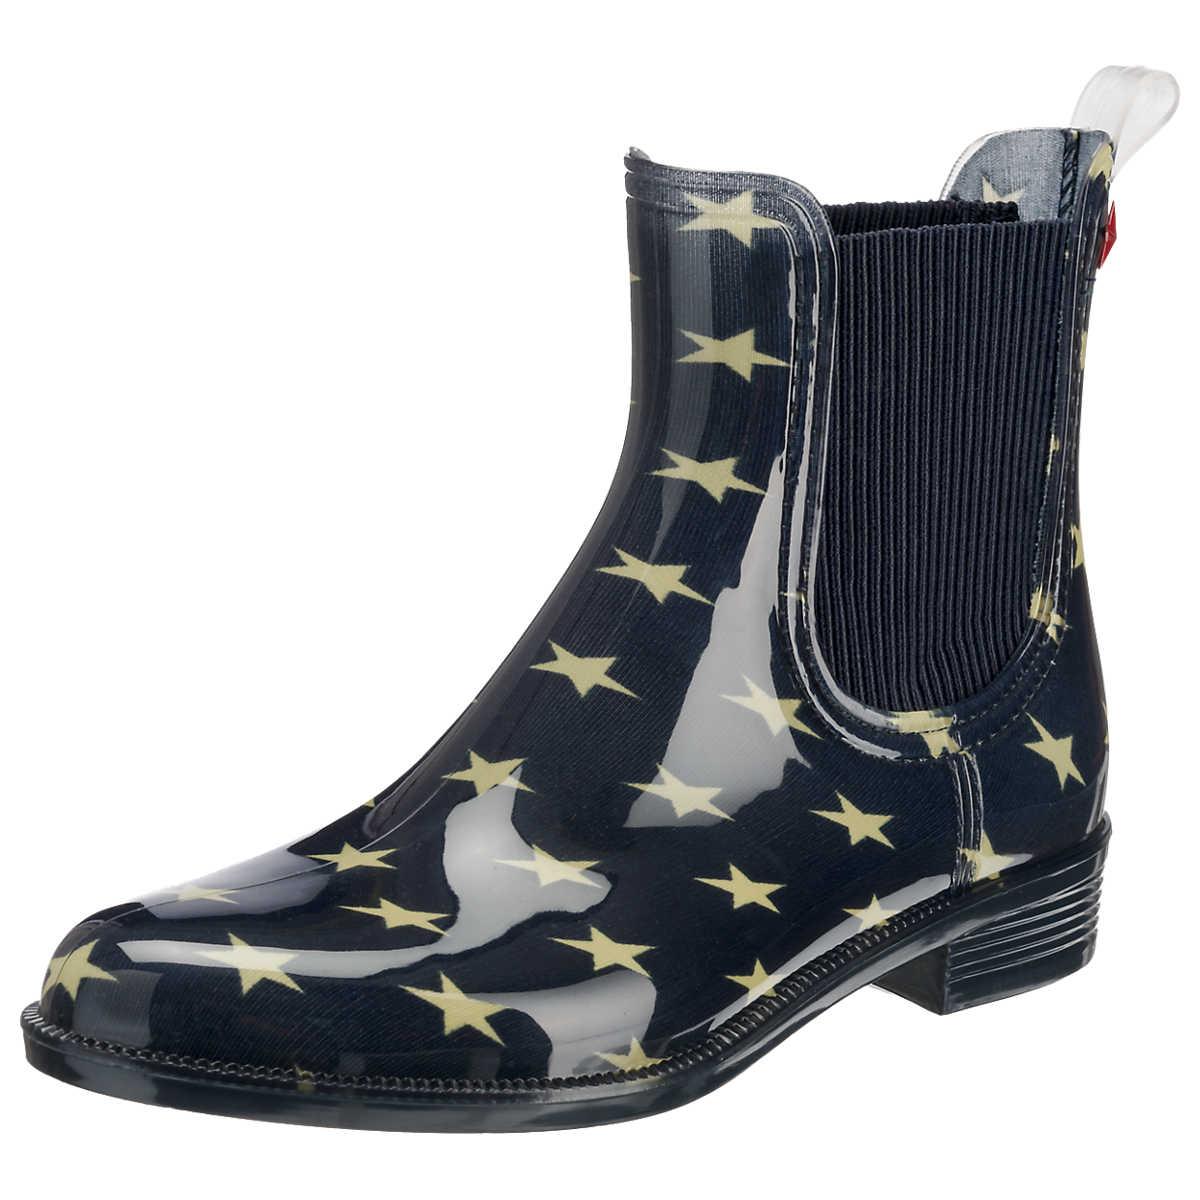 TOMMY HILFIGER Odette Stiefel blau-kombi - TOMMY HILFIGER - Stiefel - Schuhe - mirapodo.de